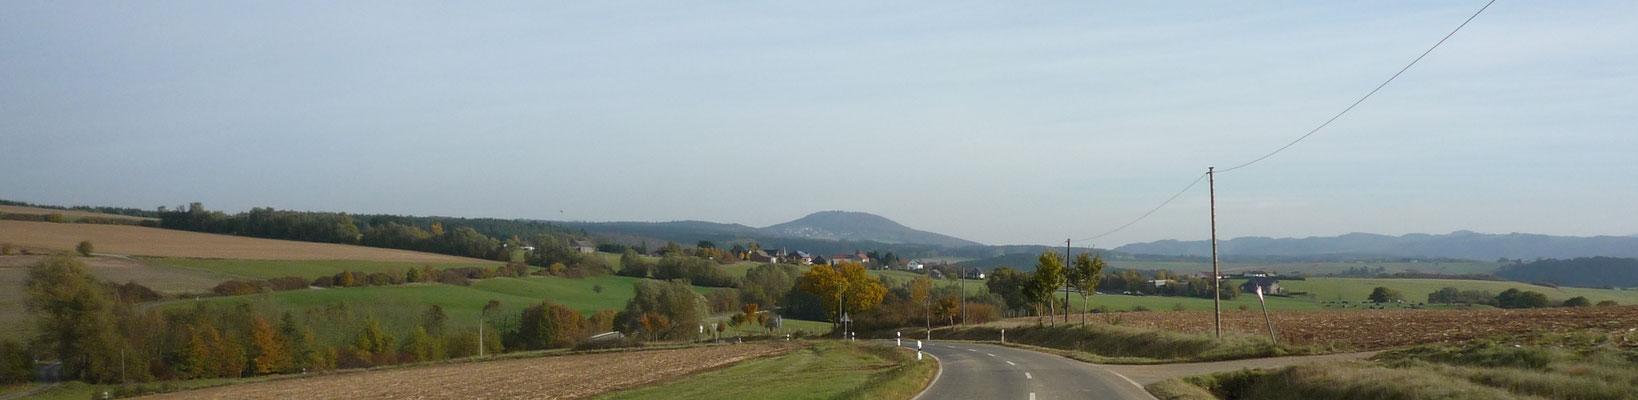 Blick auf den Vulkankegel des Arembergs